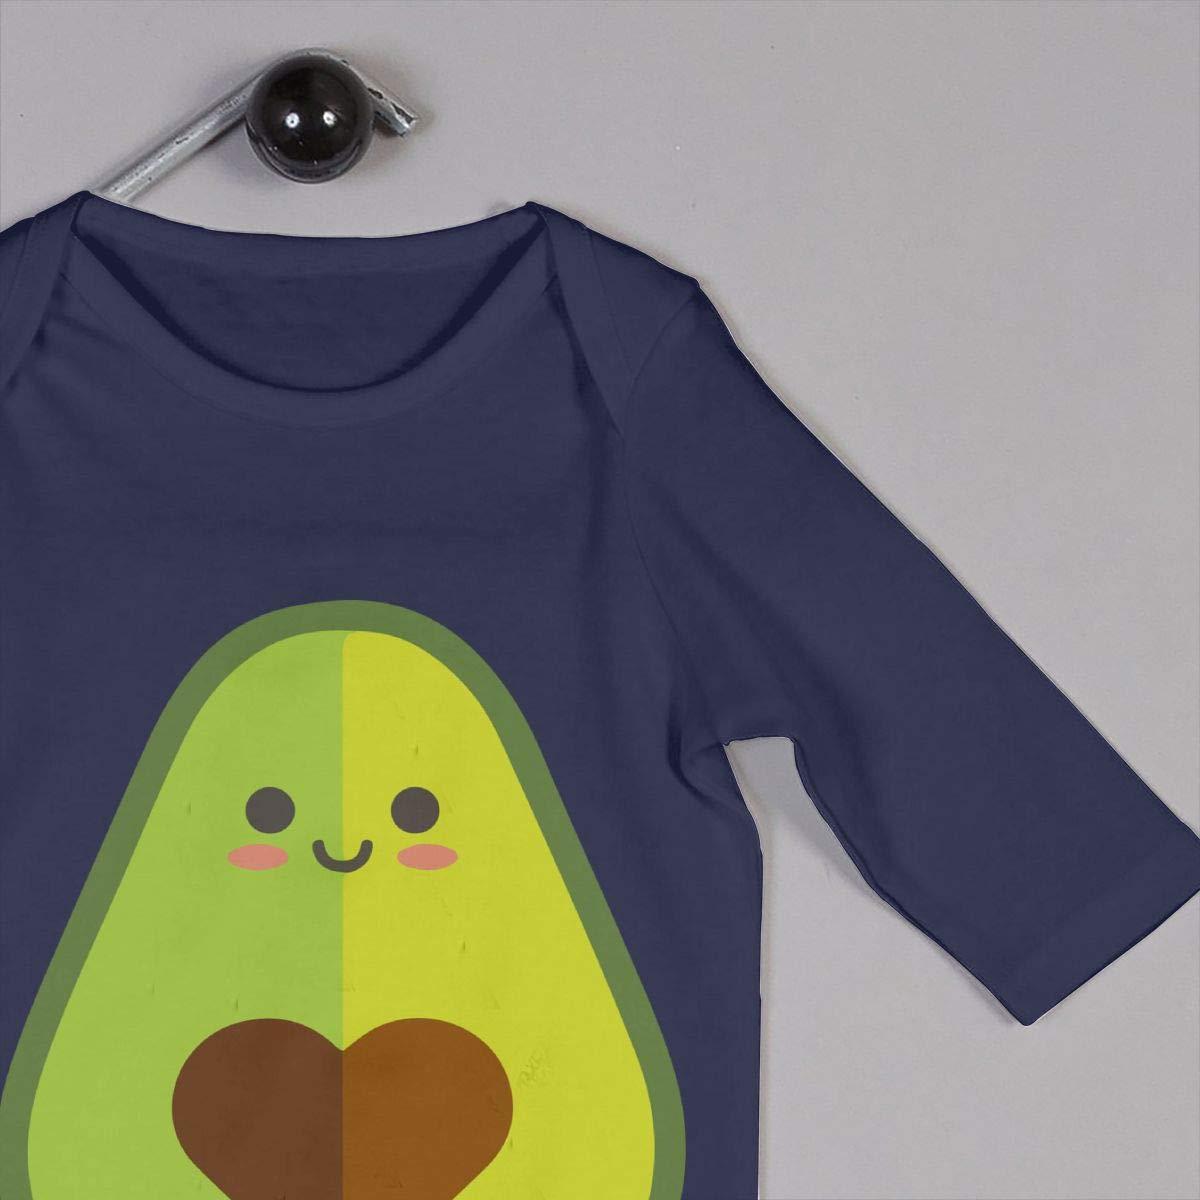 Db84UR@5p Infant Baby Girls Boys Long Sleeve Suit Little Avocado Lover Cotton Sleepwear